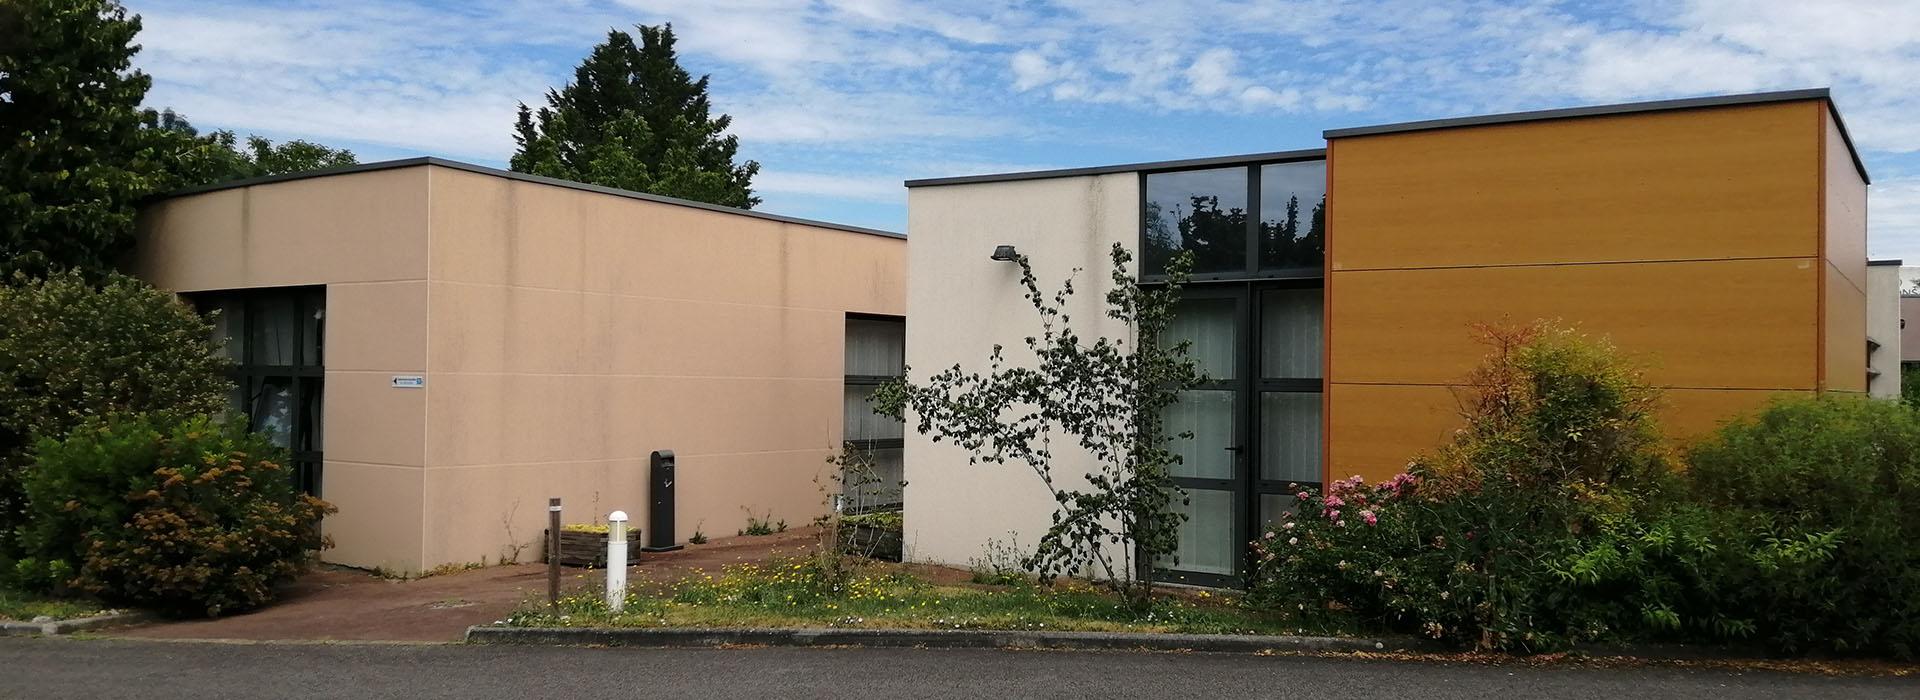 Ecole de sophrologie Caycédienne de Poitiers